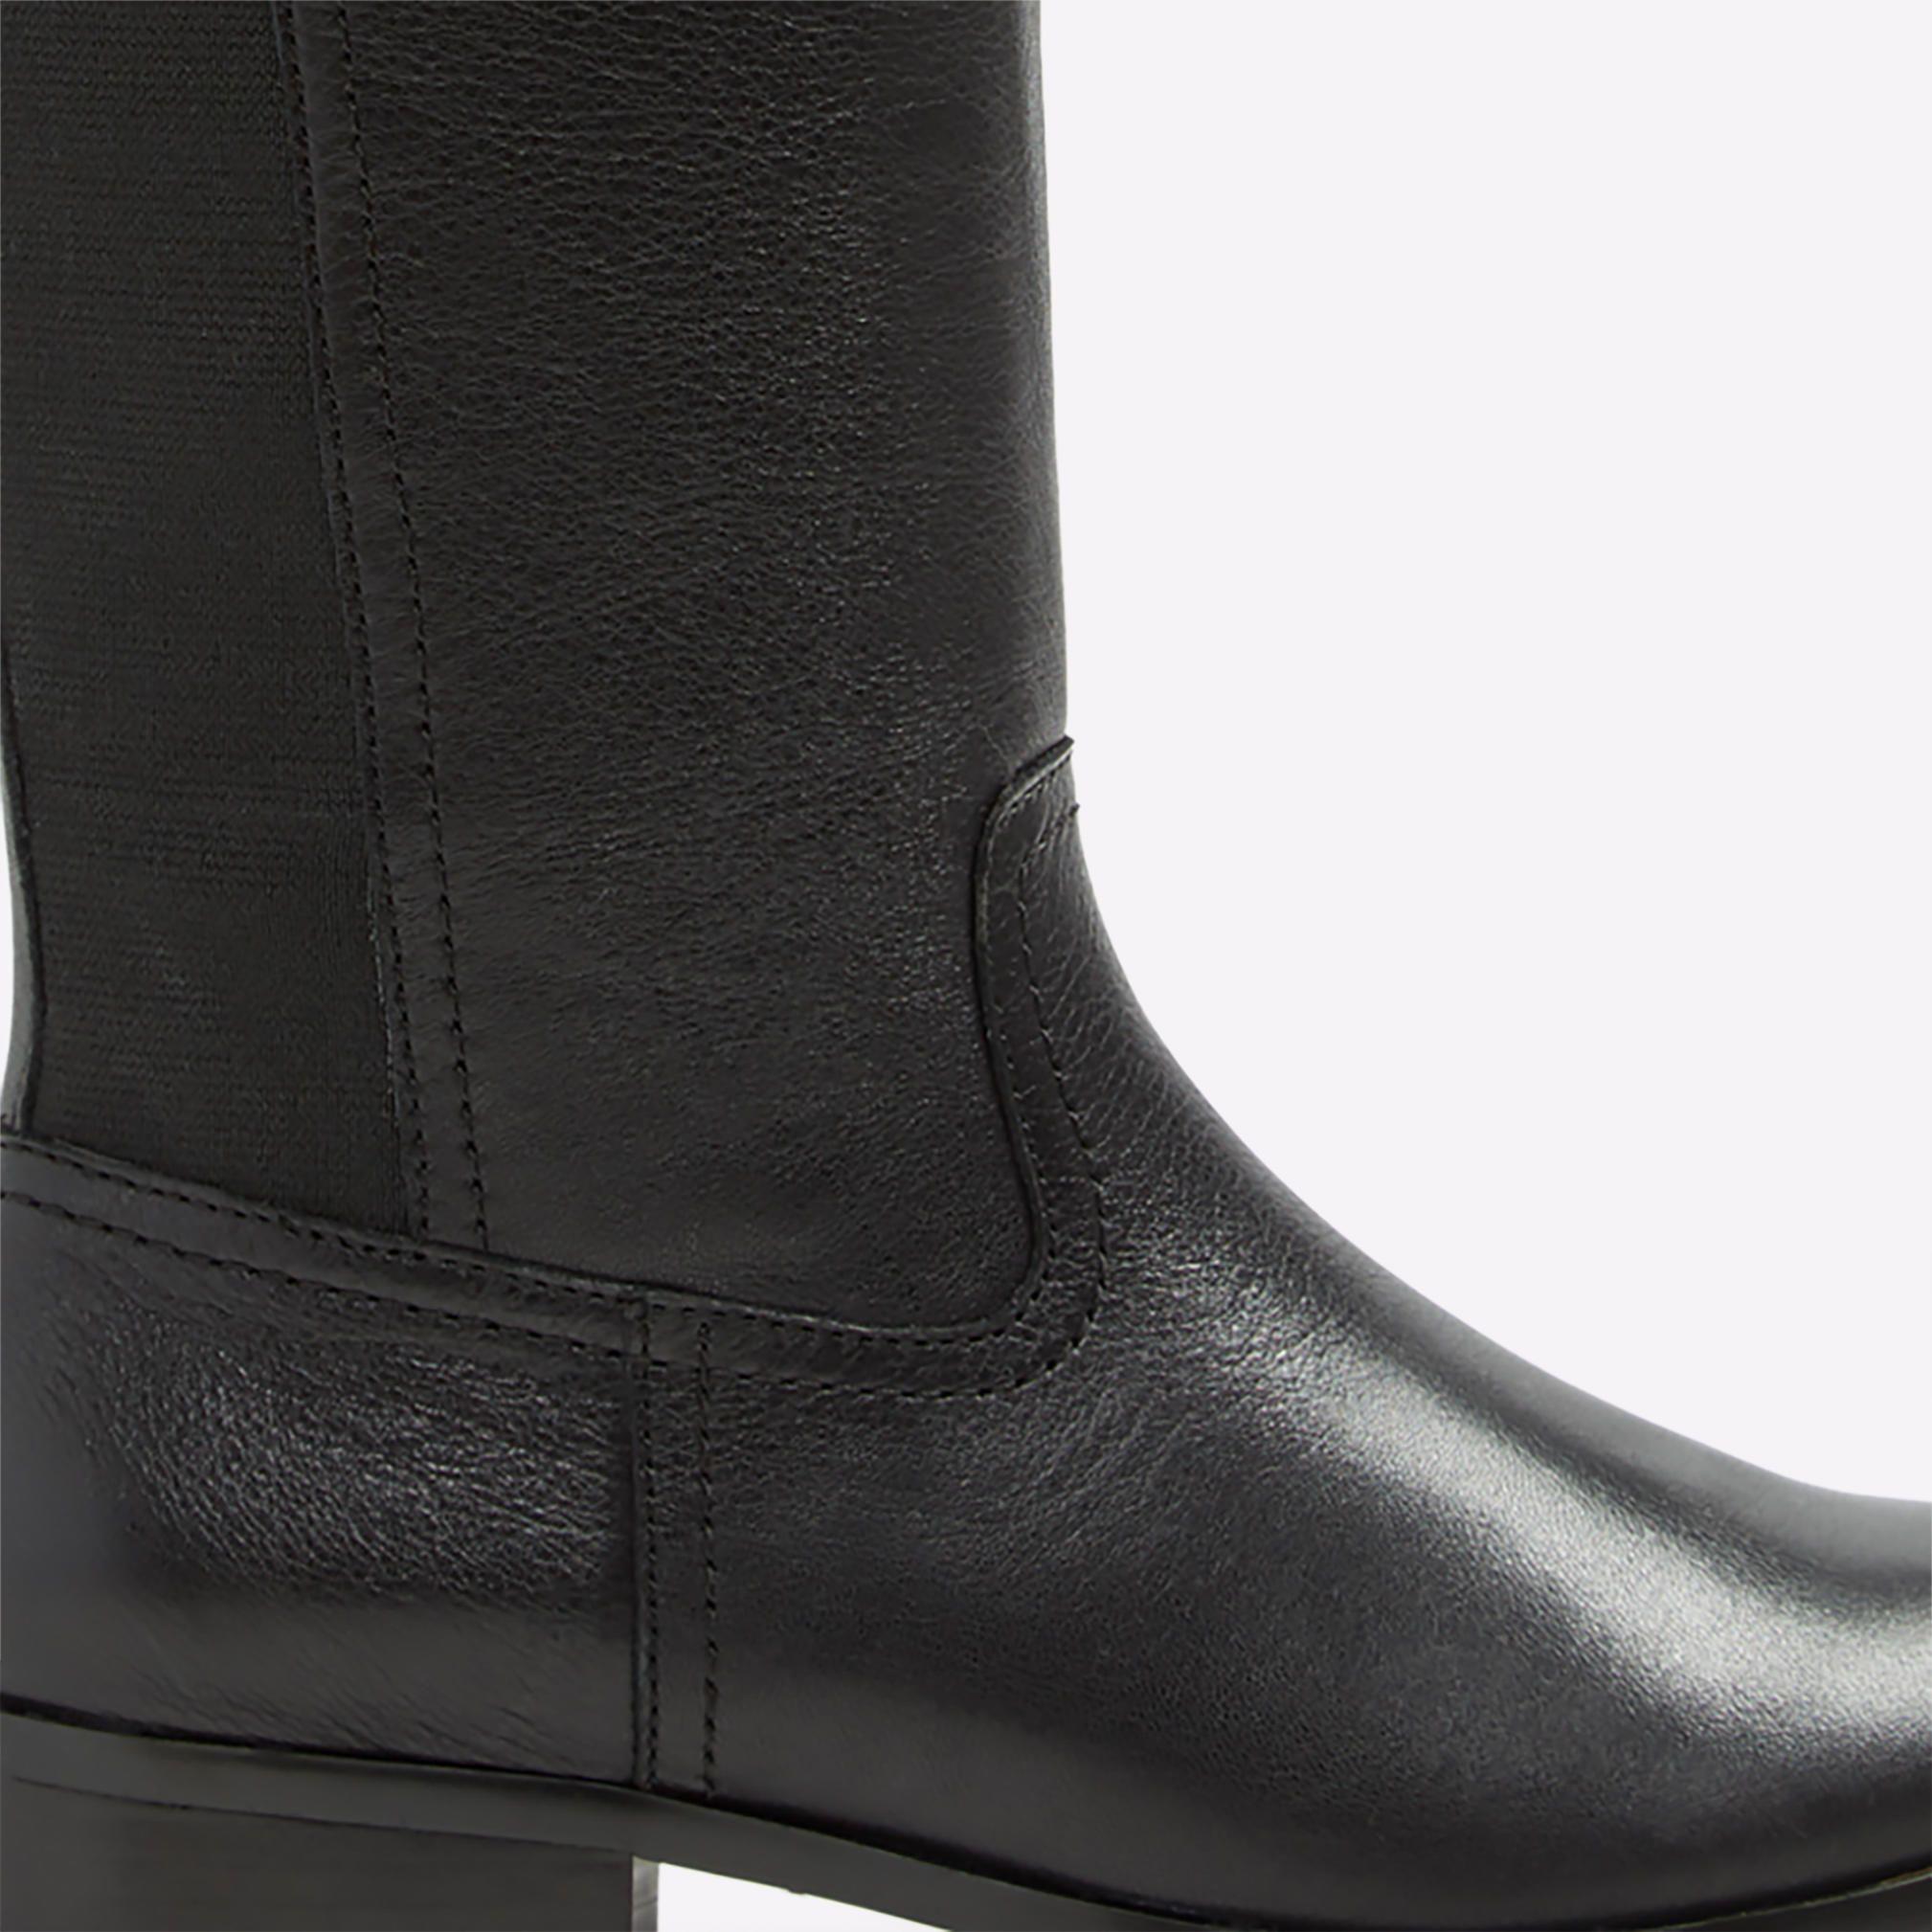 Neara Black Women's Boots | ALDO US